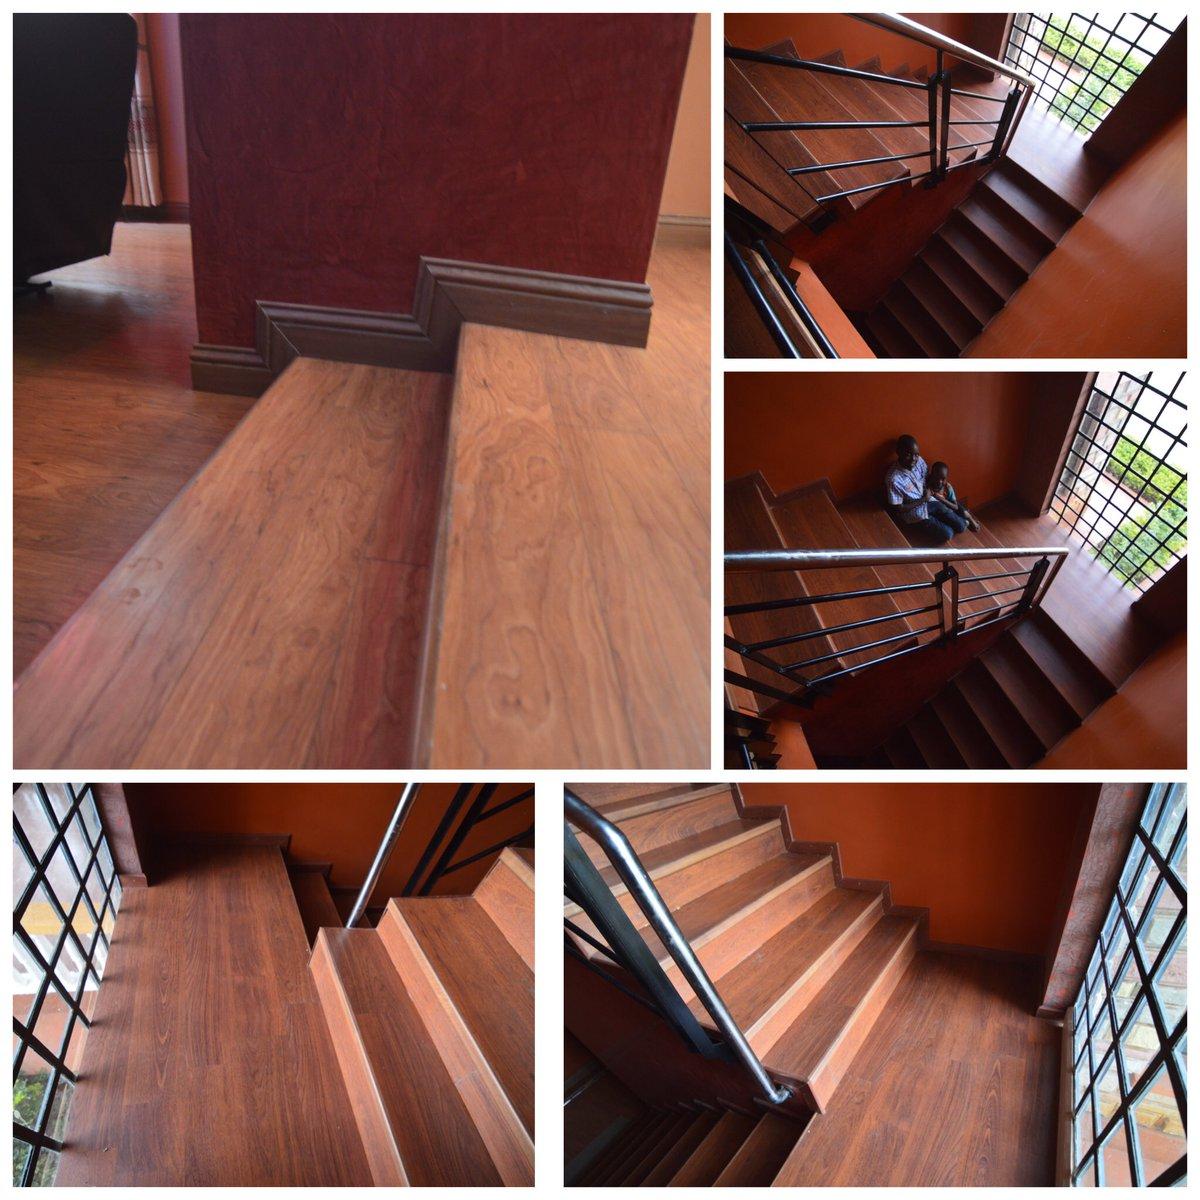 Floor Decor Kenya FloorDecorKenya Twitter - Www floordecor com